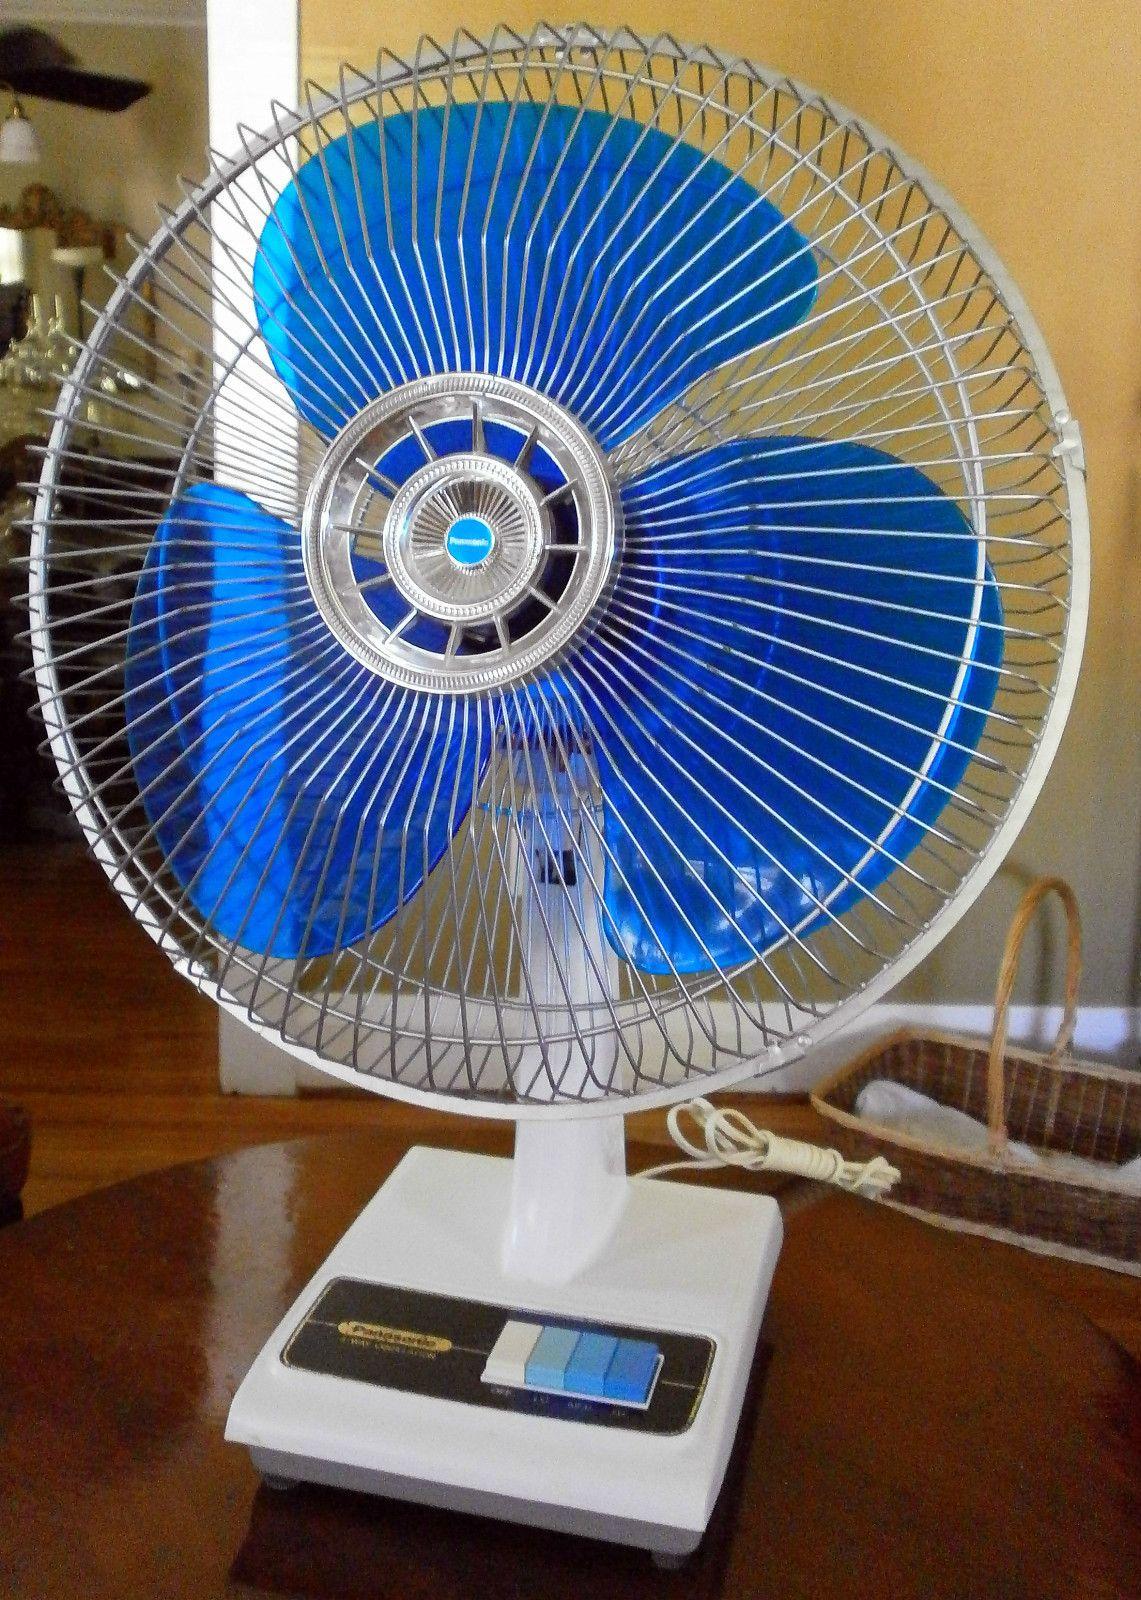 Galaxy Pedestal Fan : S panasonic quot oscillating fan blue blades model